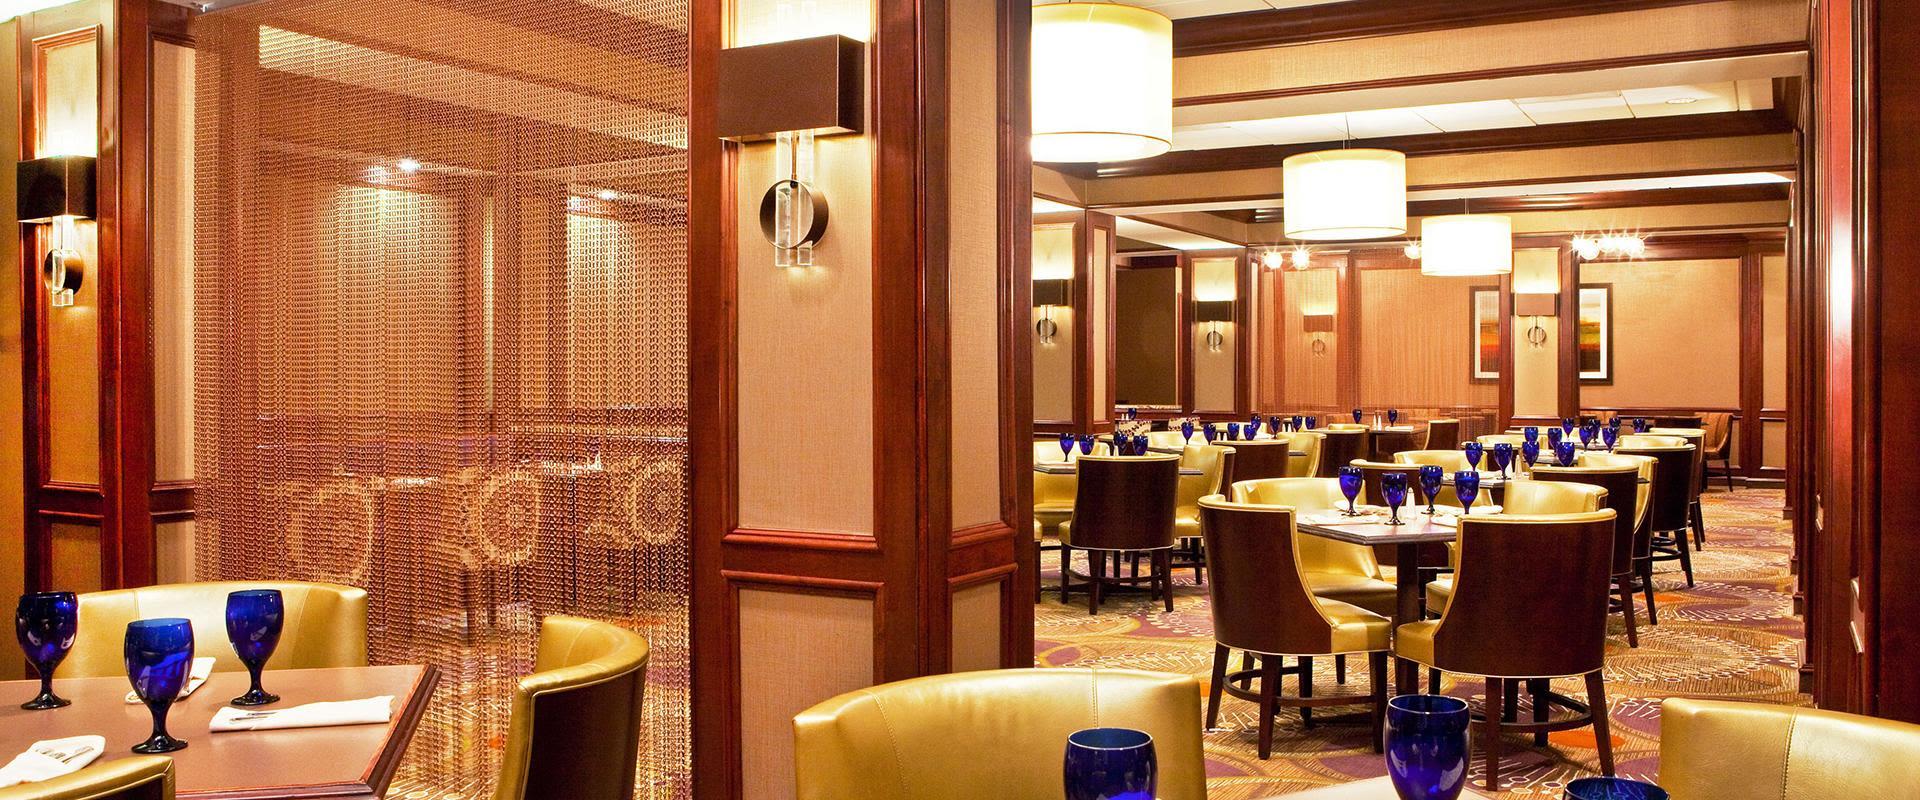 Atlanta Airport Hotel Restaurant Seating Area